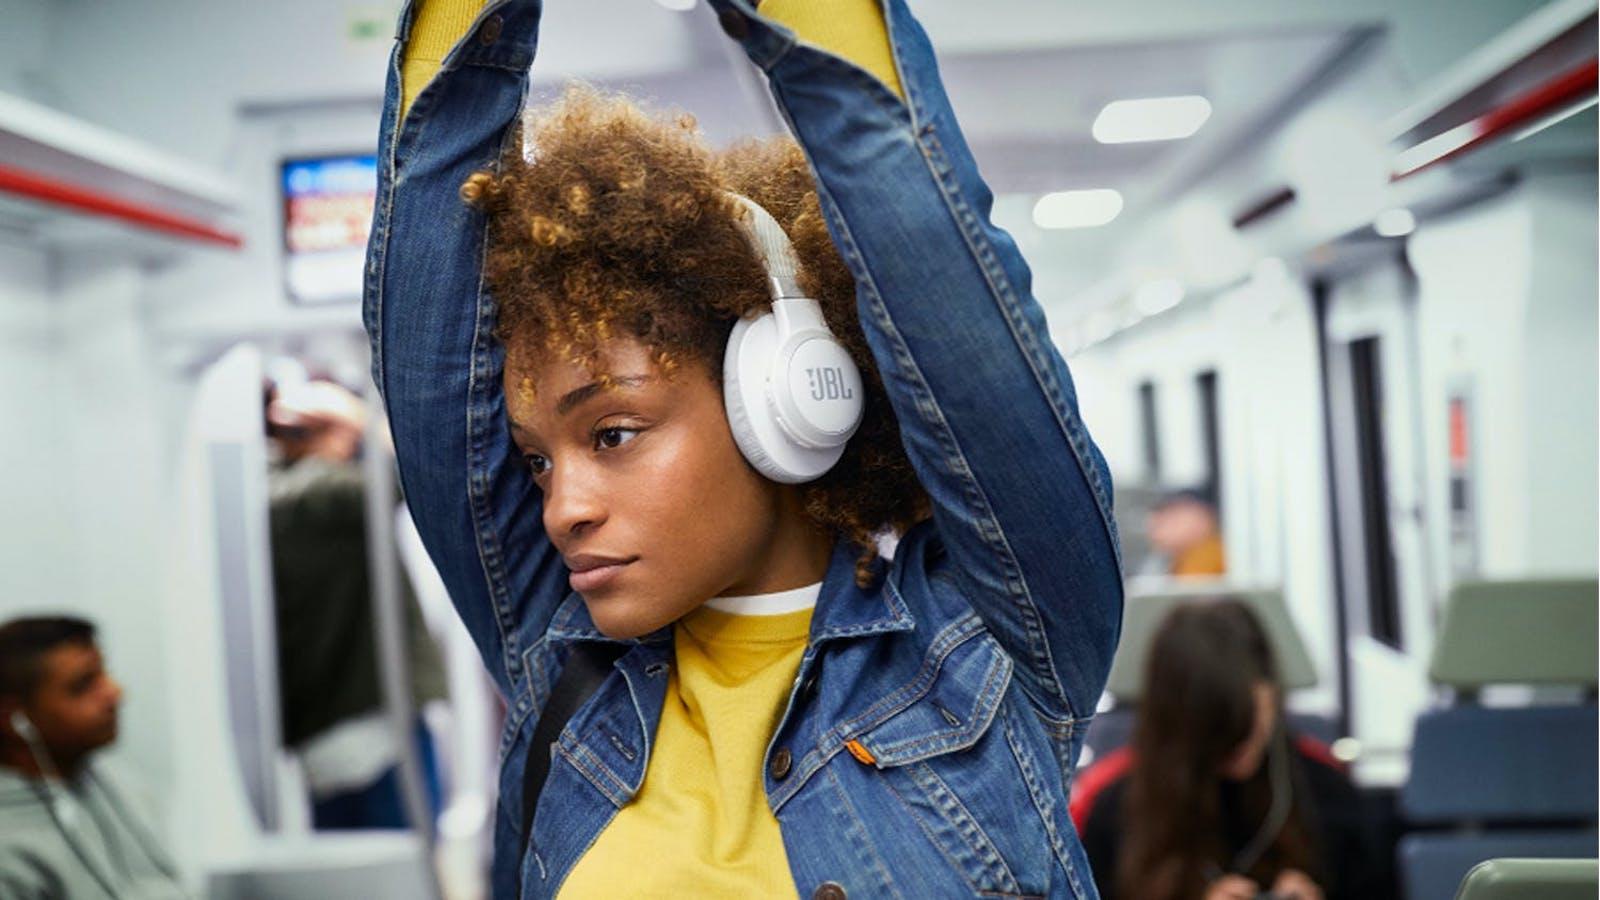 JBL LIVE 650BTNC Wireless Hands-Free Headphones